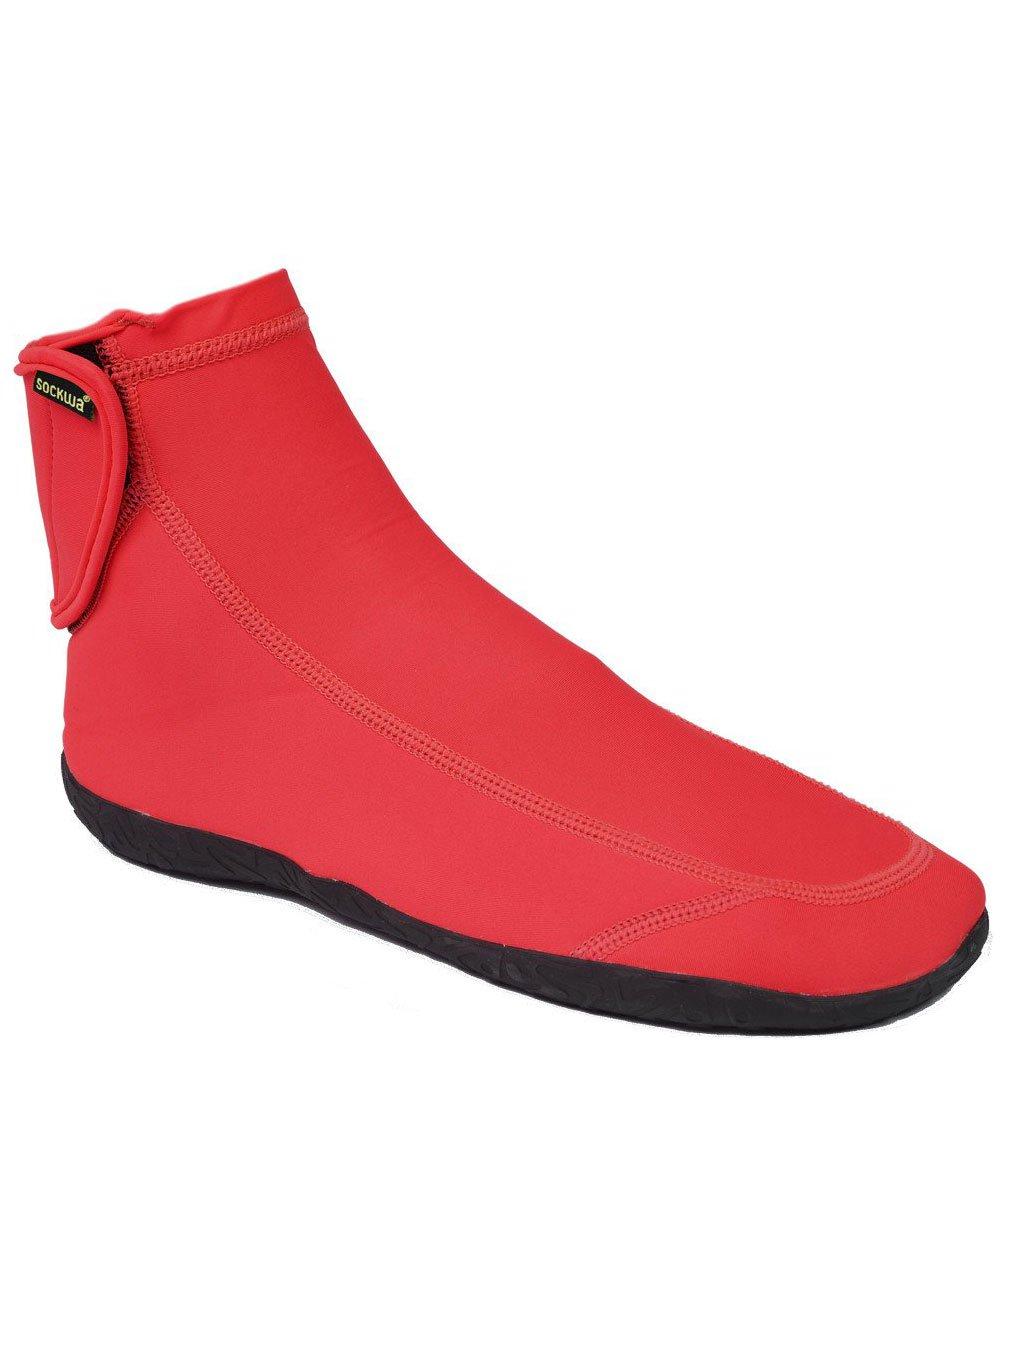 Sockwa G-HI Minimal Beach Sneaker B00KZ31PCO 12 M US|Red